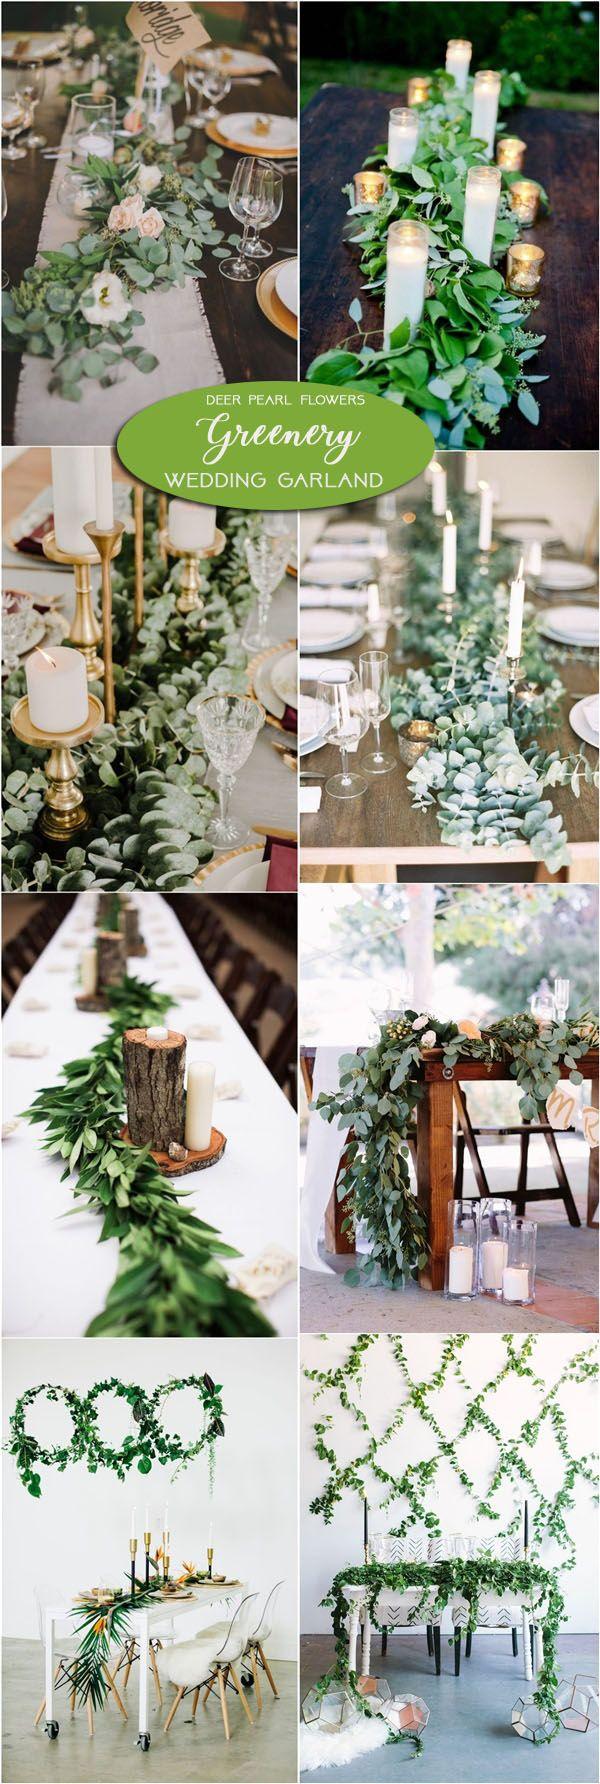 greenery wedding table floral garland centerpiece decor httpwwwdeerpearlflowers